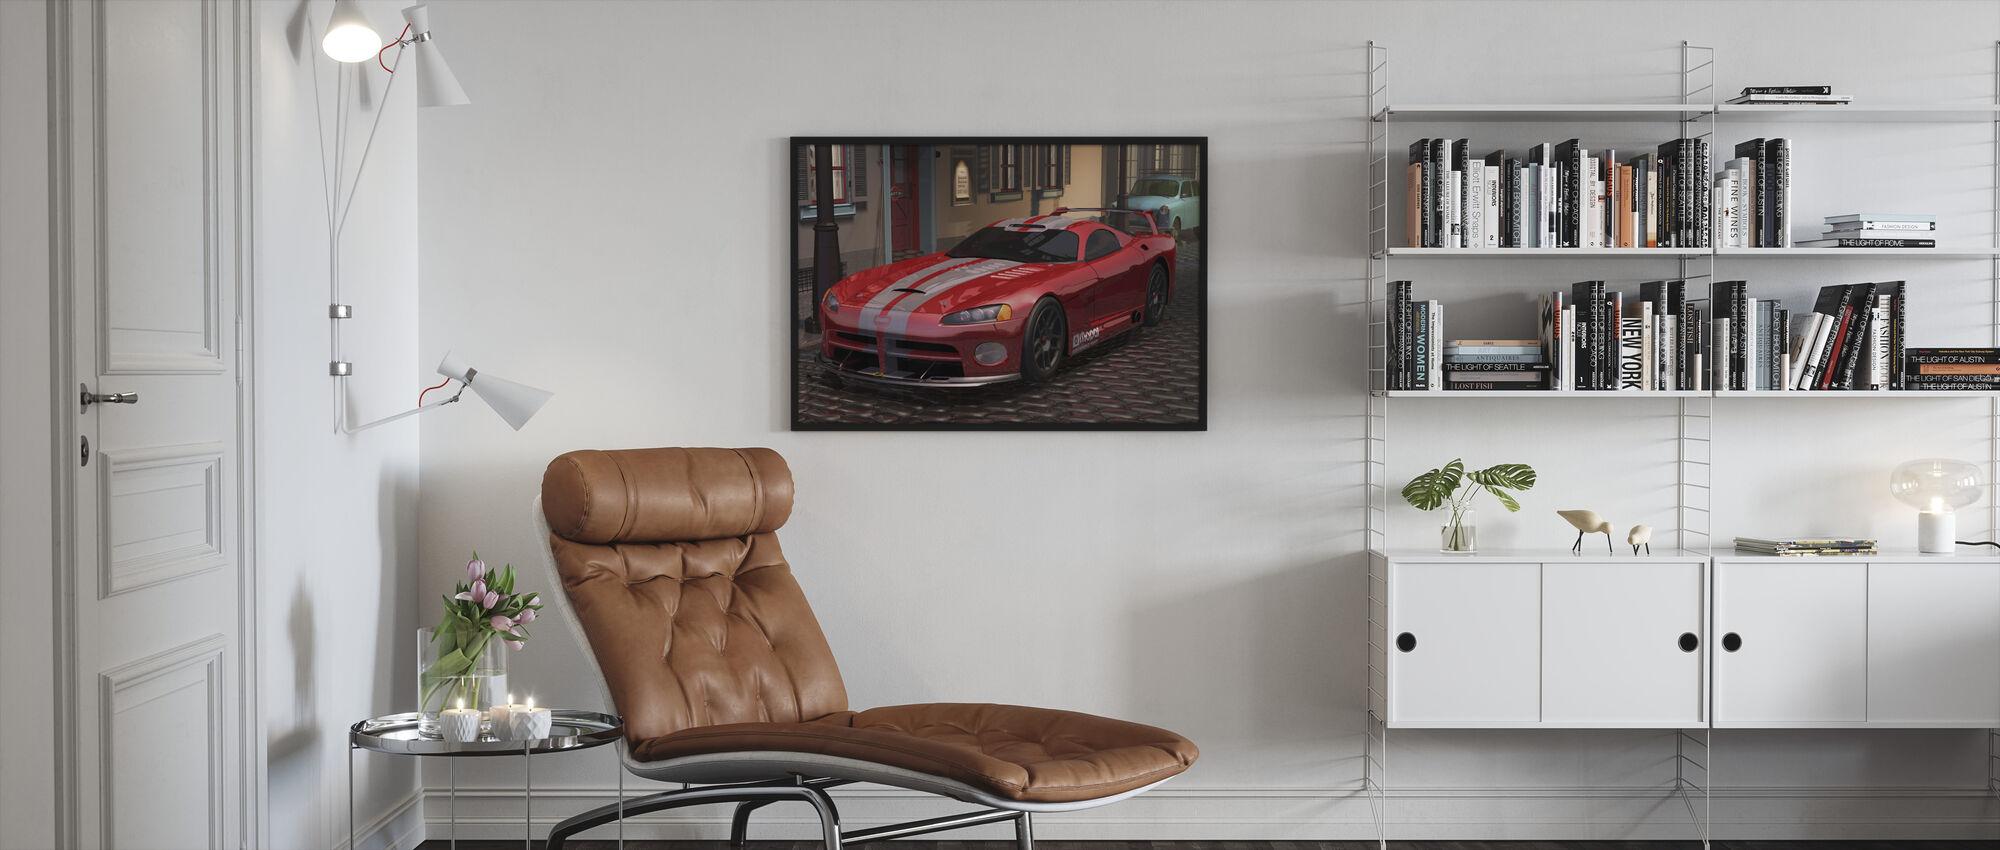 Rode Snelle auto - Ingelijste print - Woonkamer